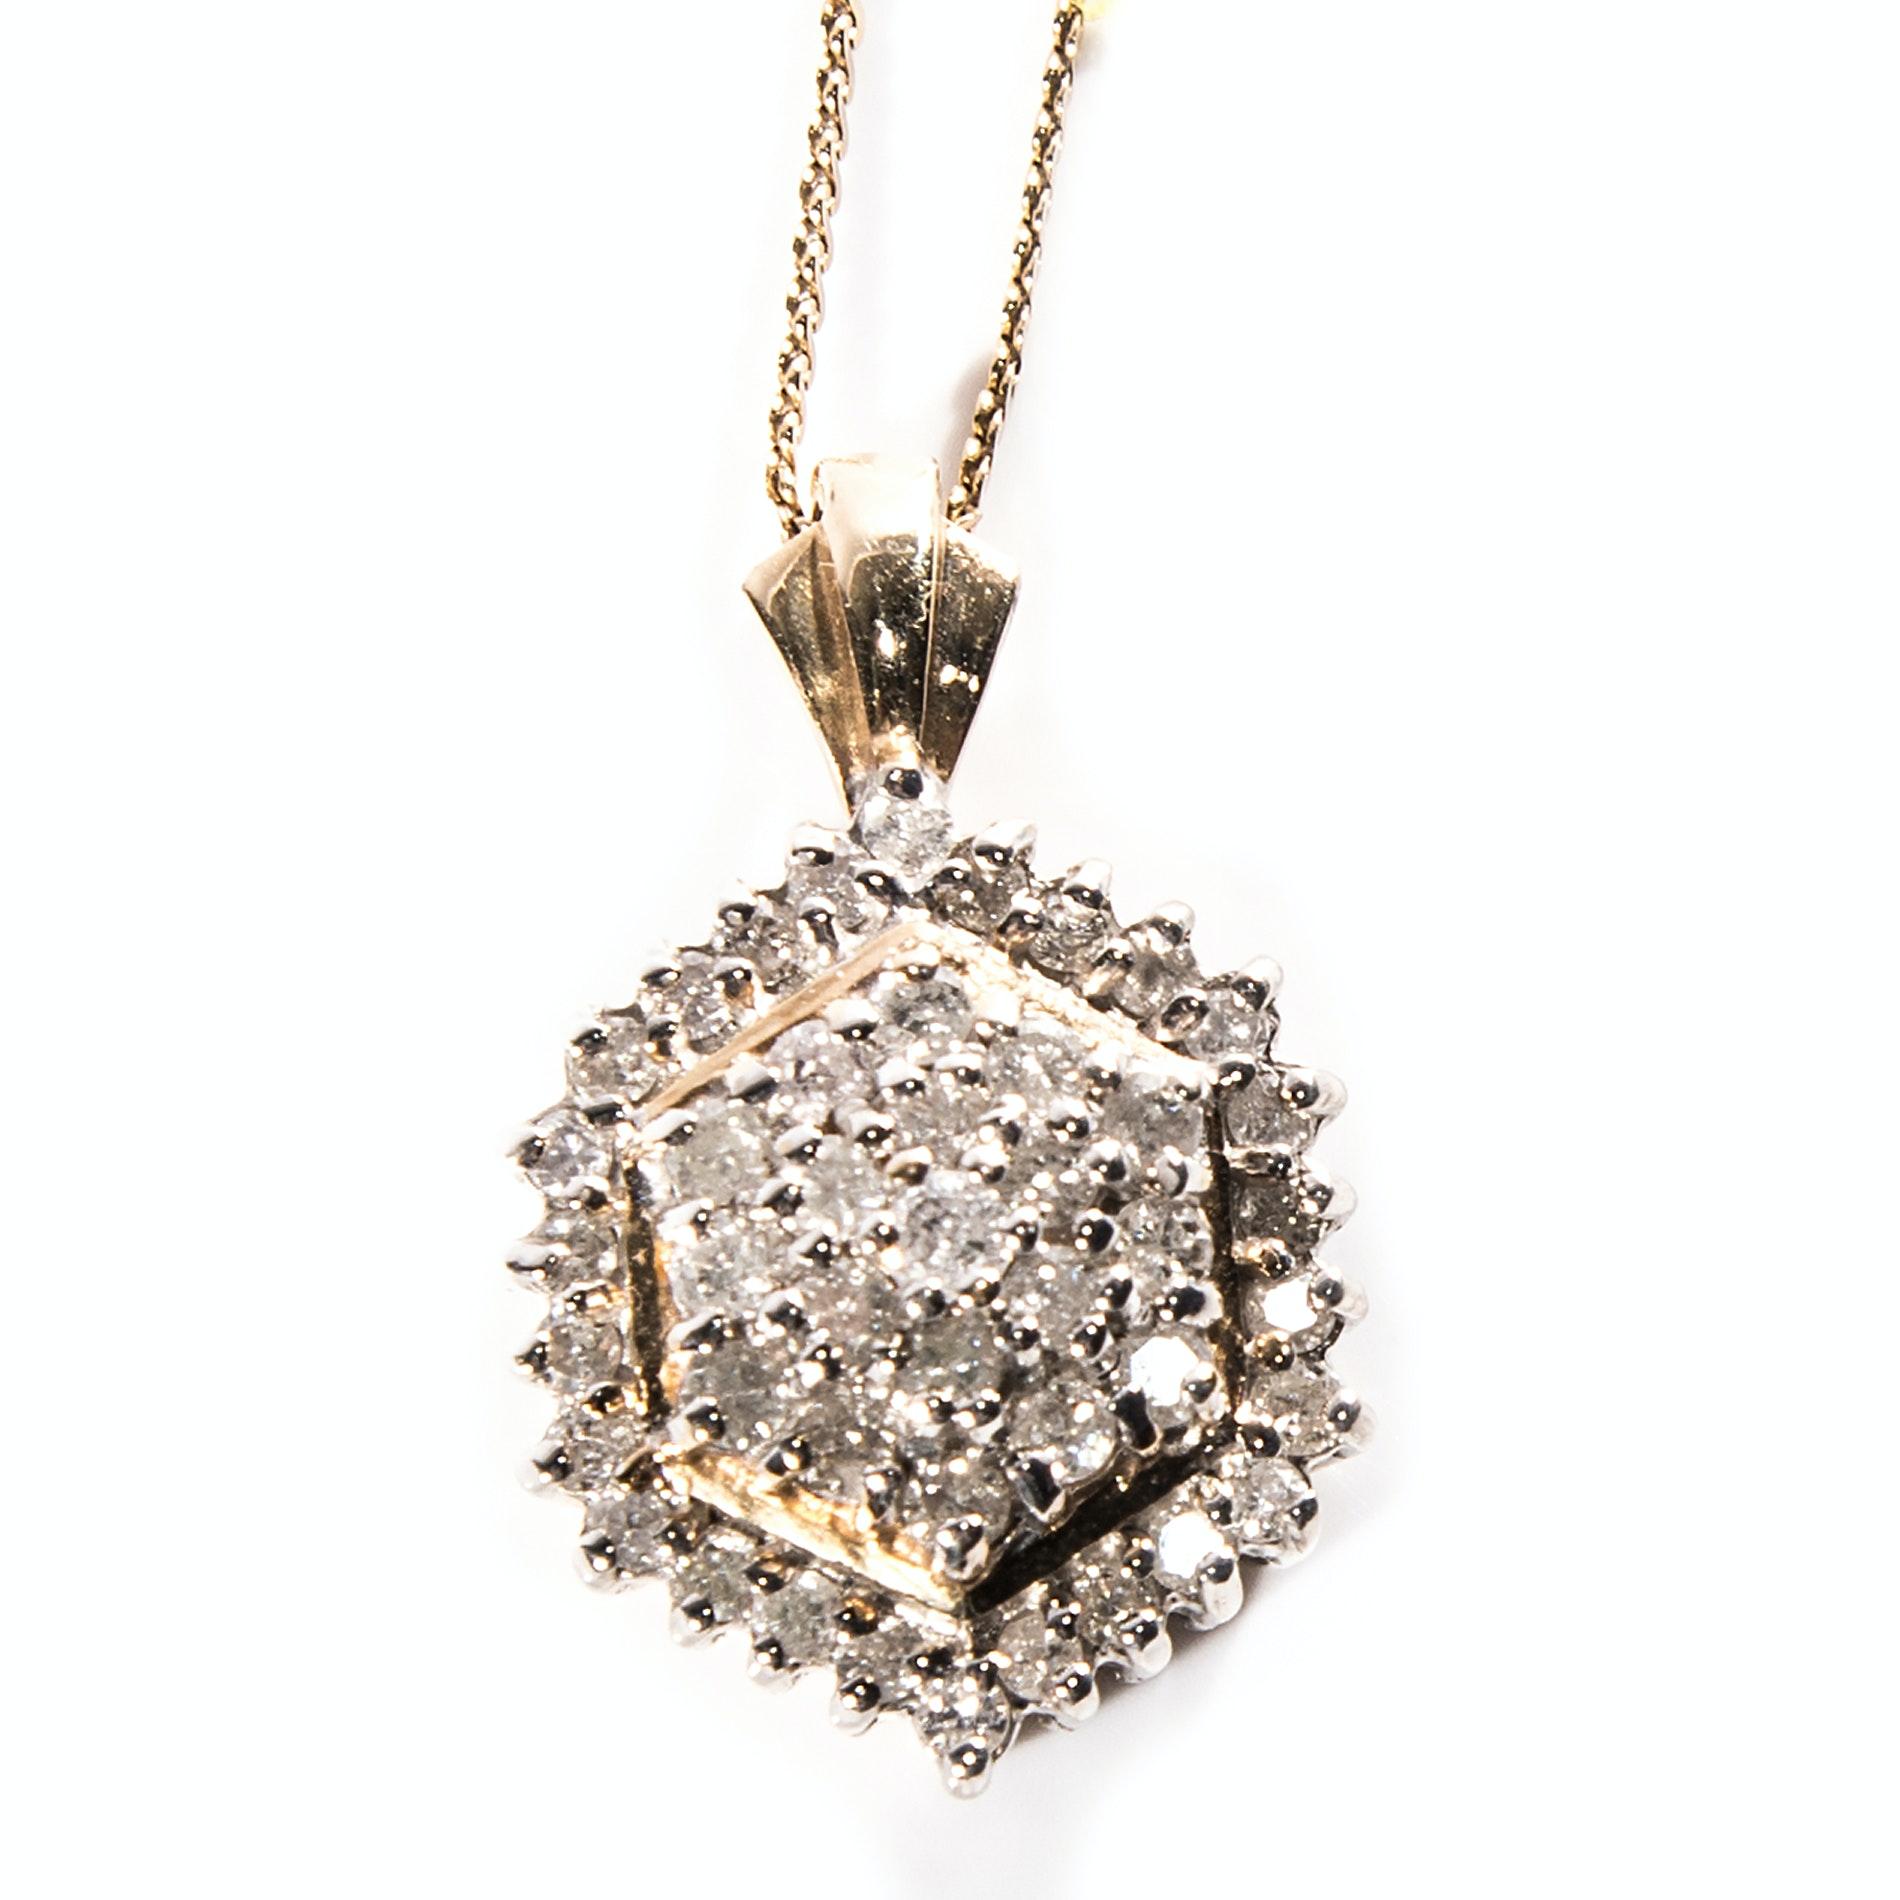 14K Gold and 1.06 CTW Diamond Cluster Pendant